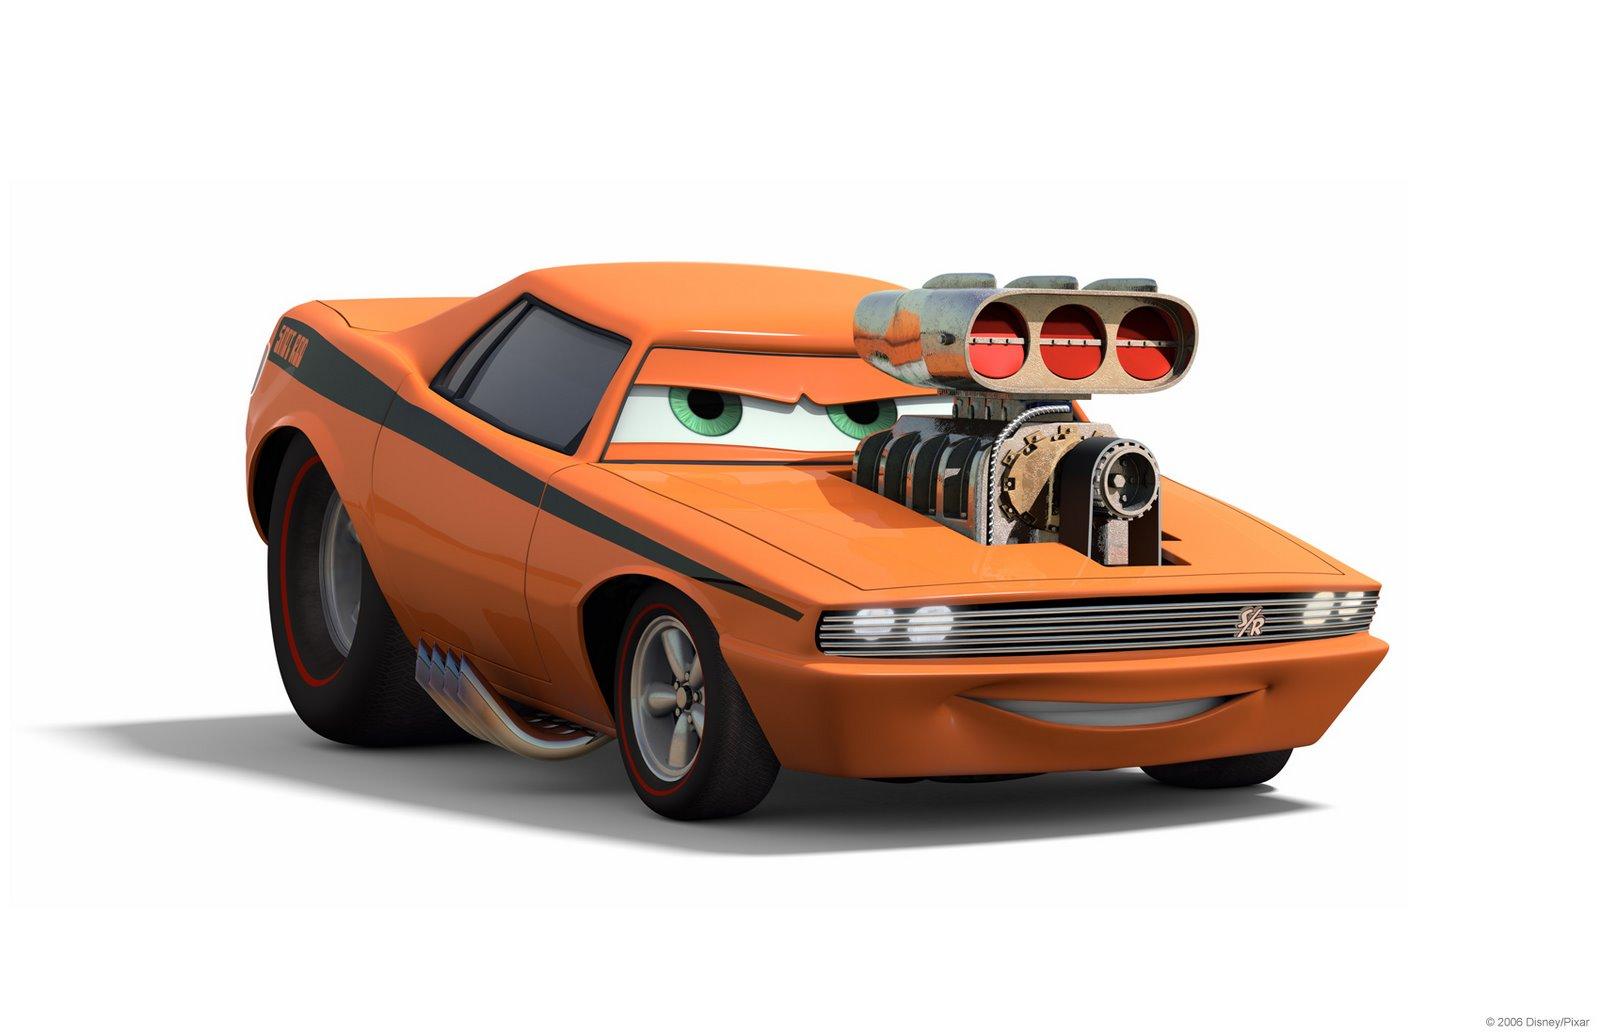 Duelo 3D Nº 02 @cry_Nash-1352 Vs @0997sebastian - Cars_Pixar Snot_rod_side